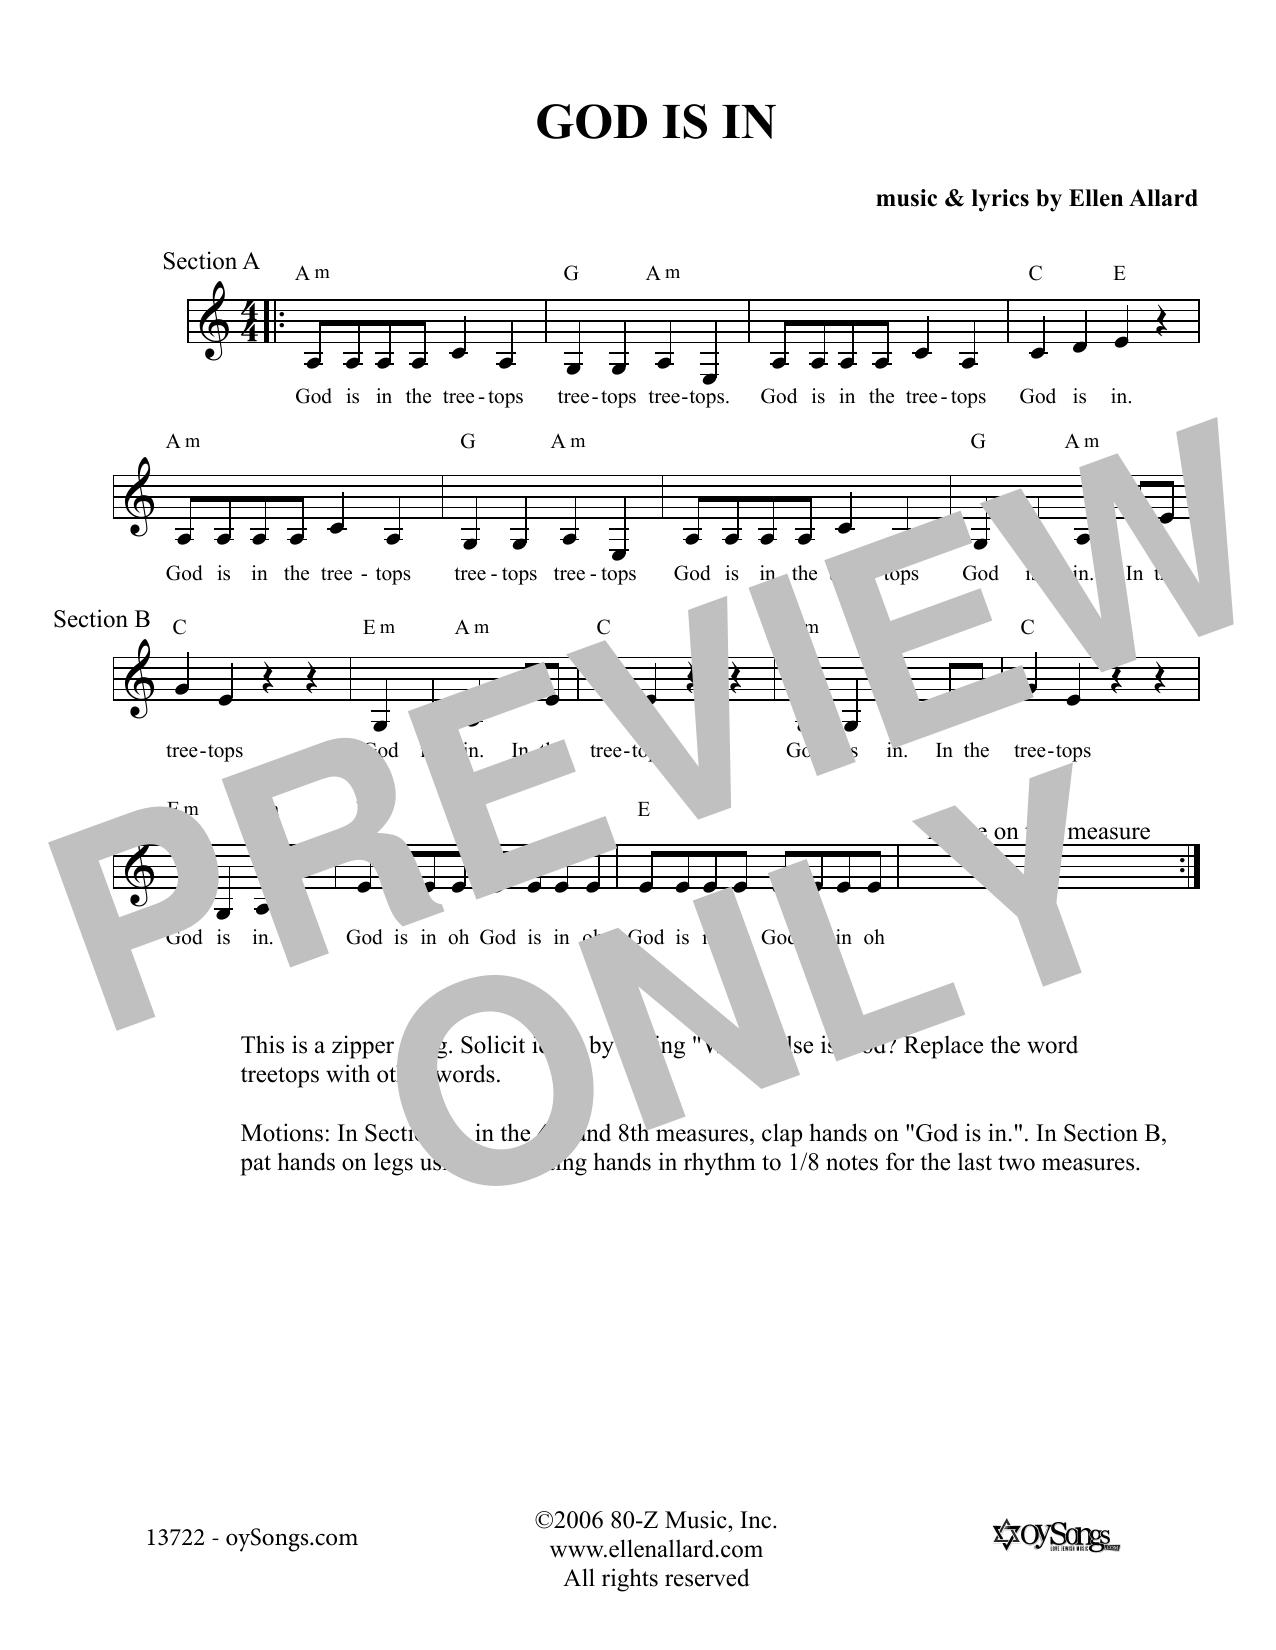 Ellen Allard God Is In sheet music notes and chords. Download Printable PDF.